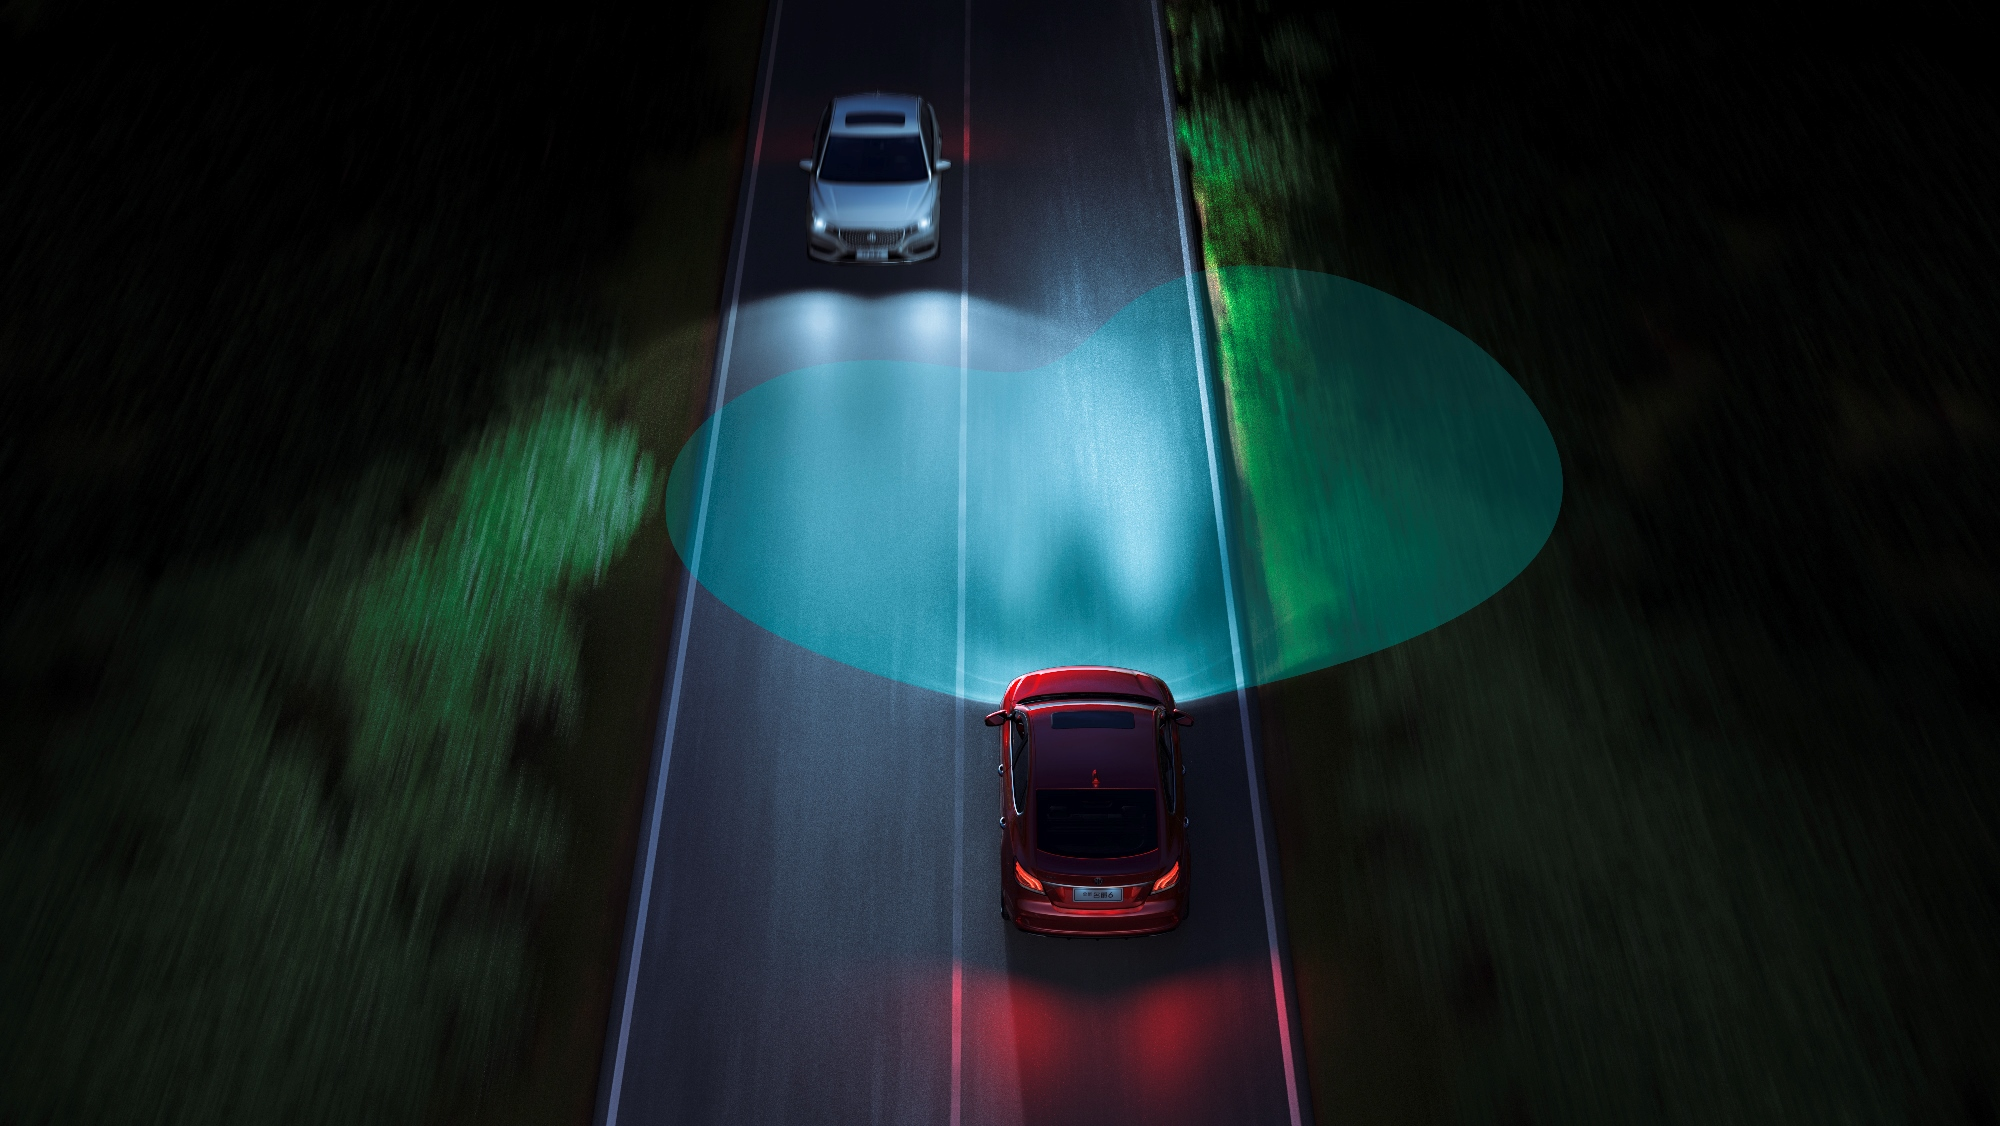 IHC智能远近光控制系统